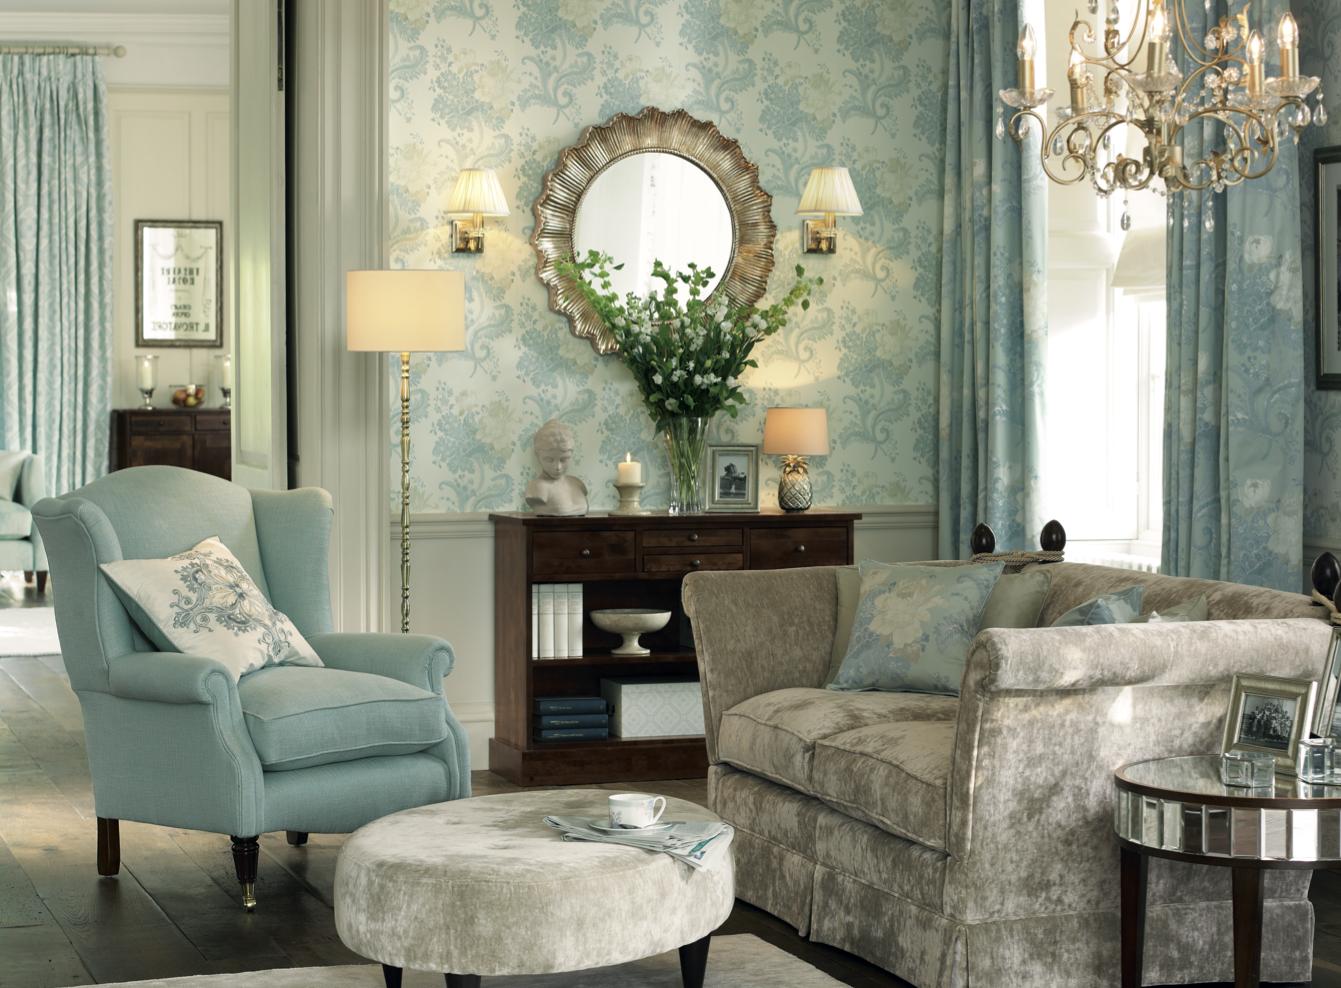 Laura Ashley 2014 Interiors Collection Operetta